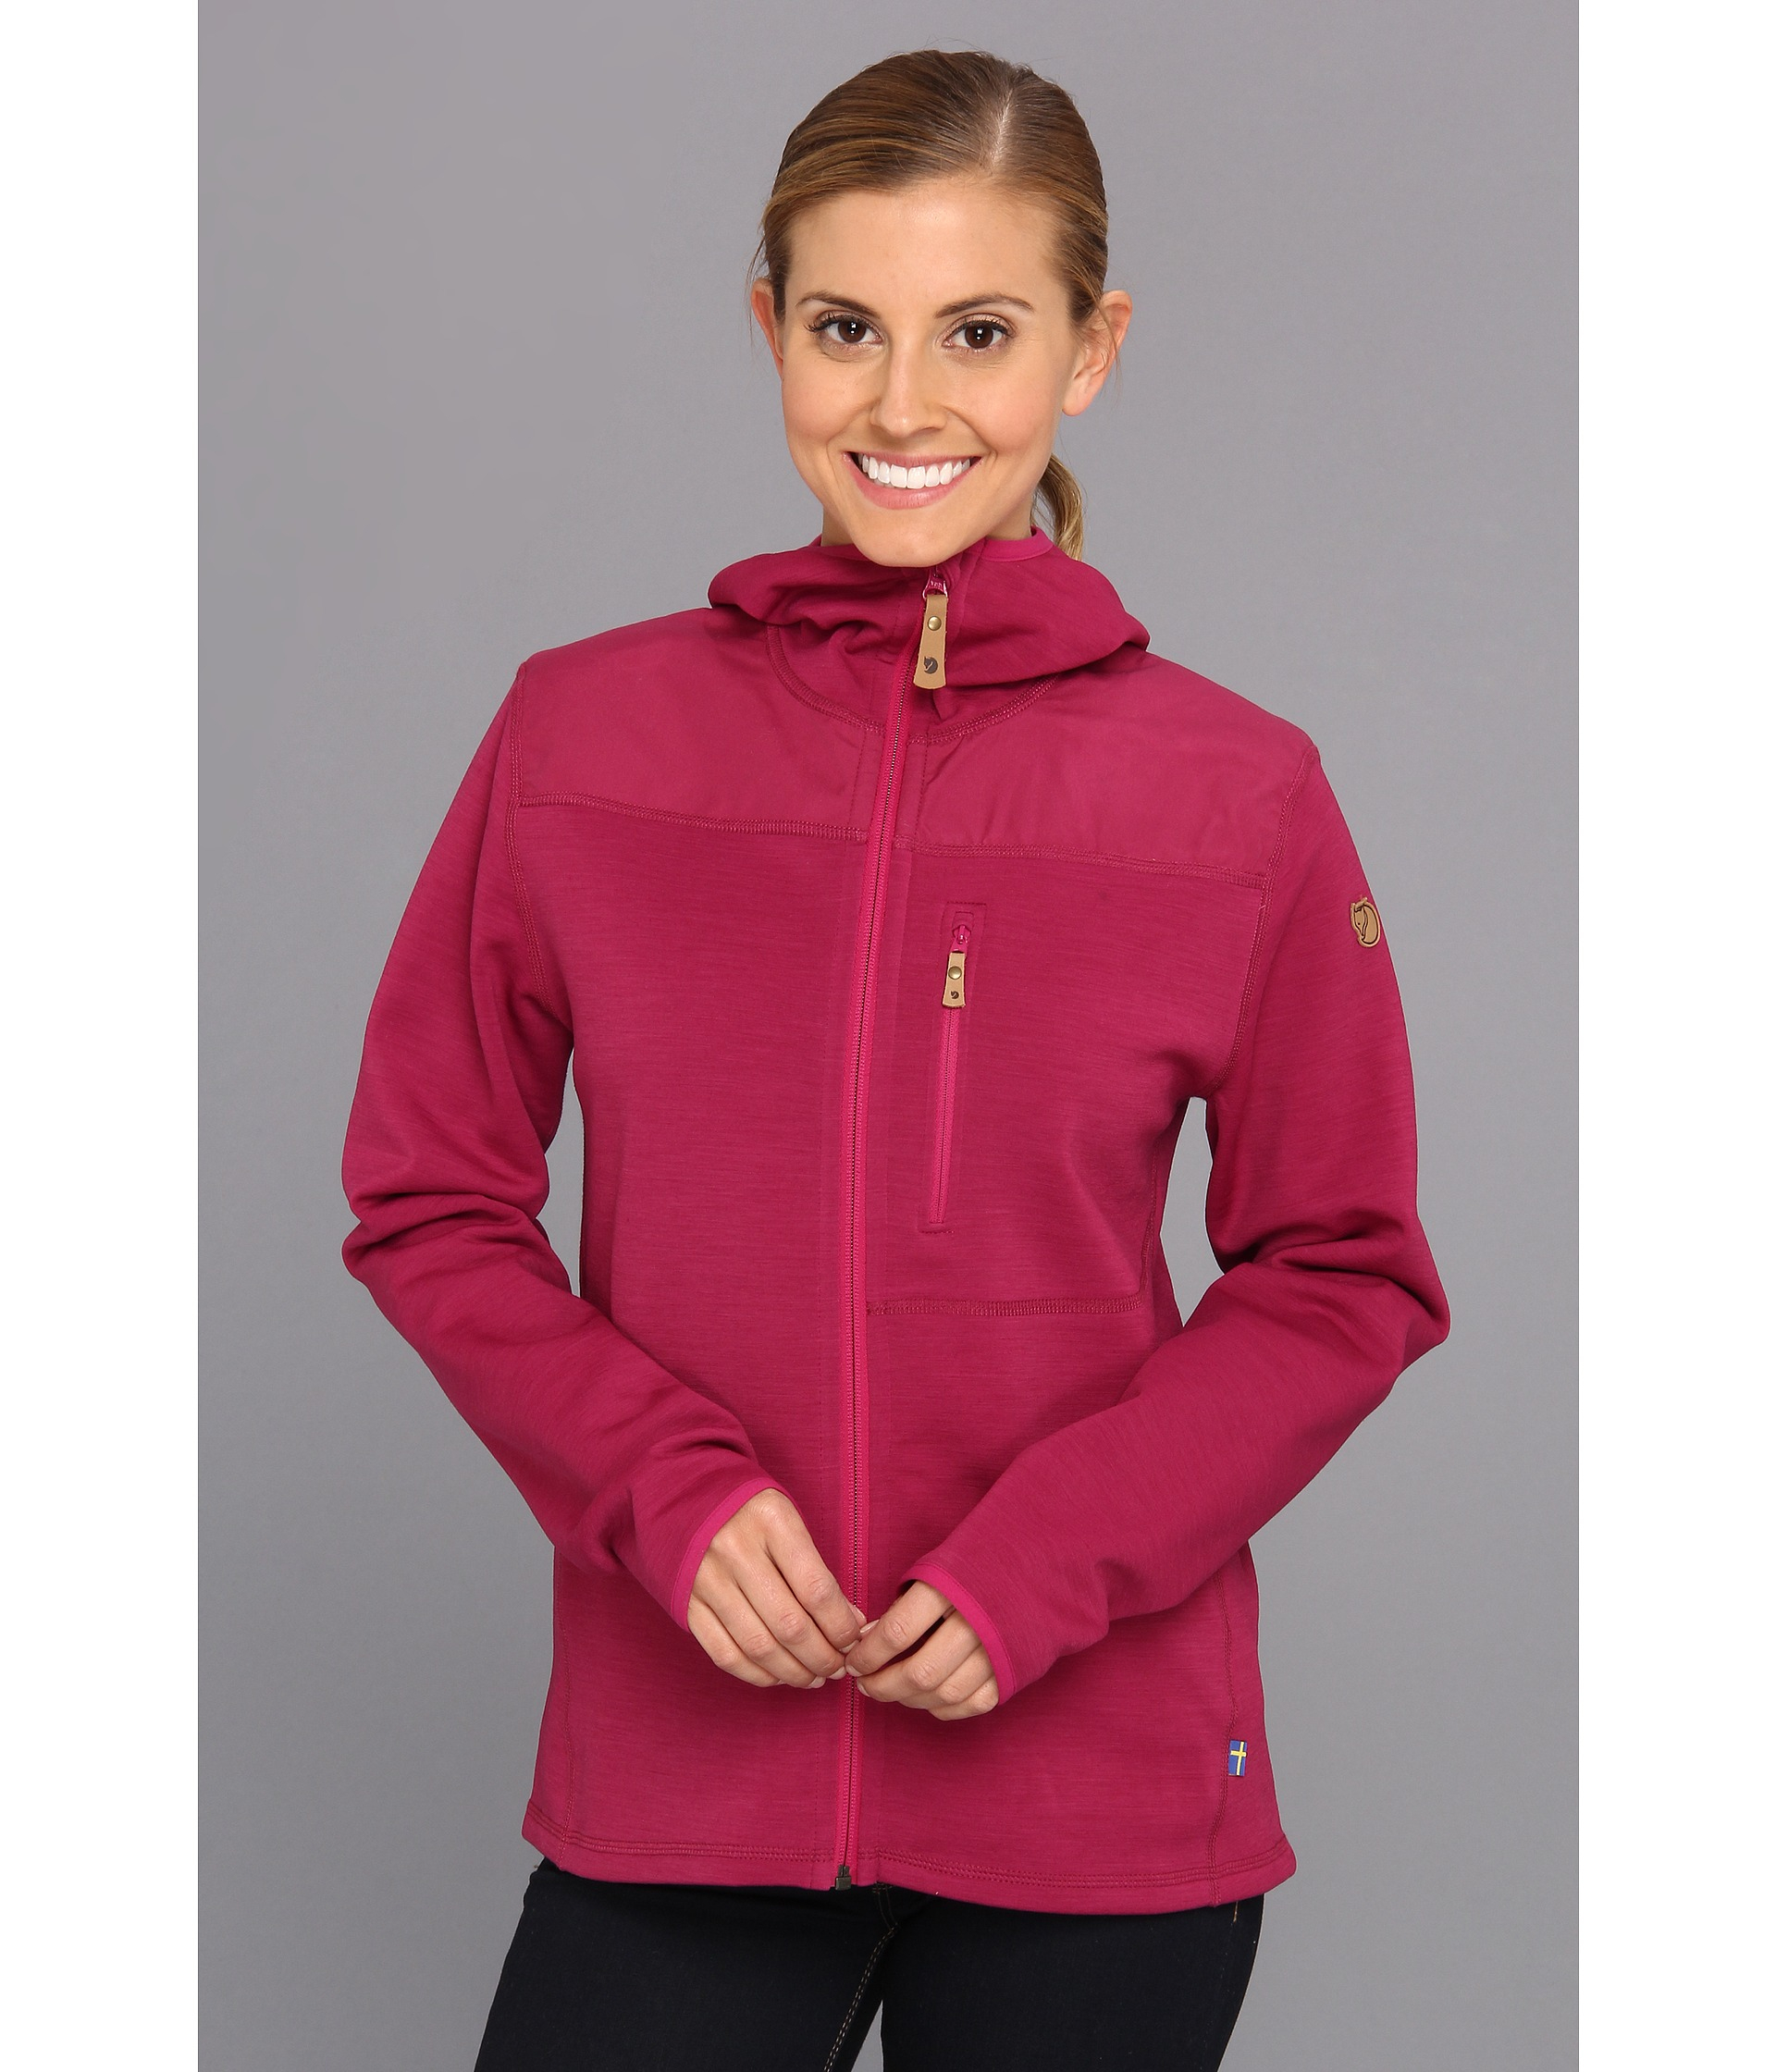 Fjallraven Keb Fleece Jacket in Pink | Lyst